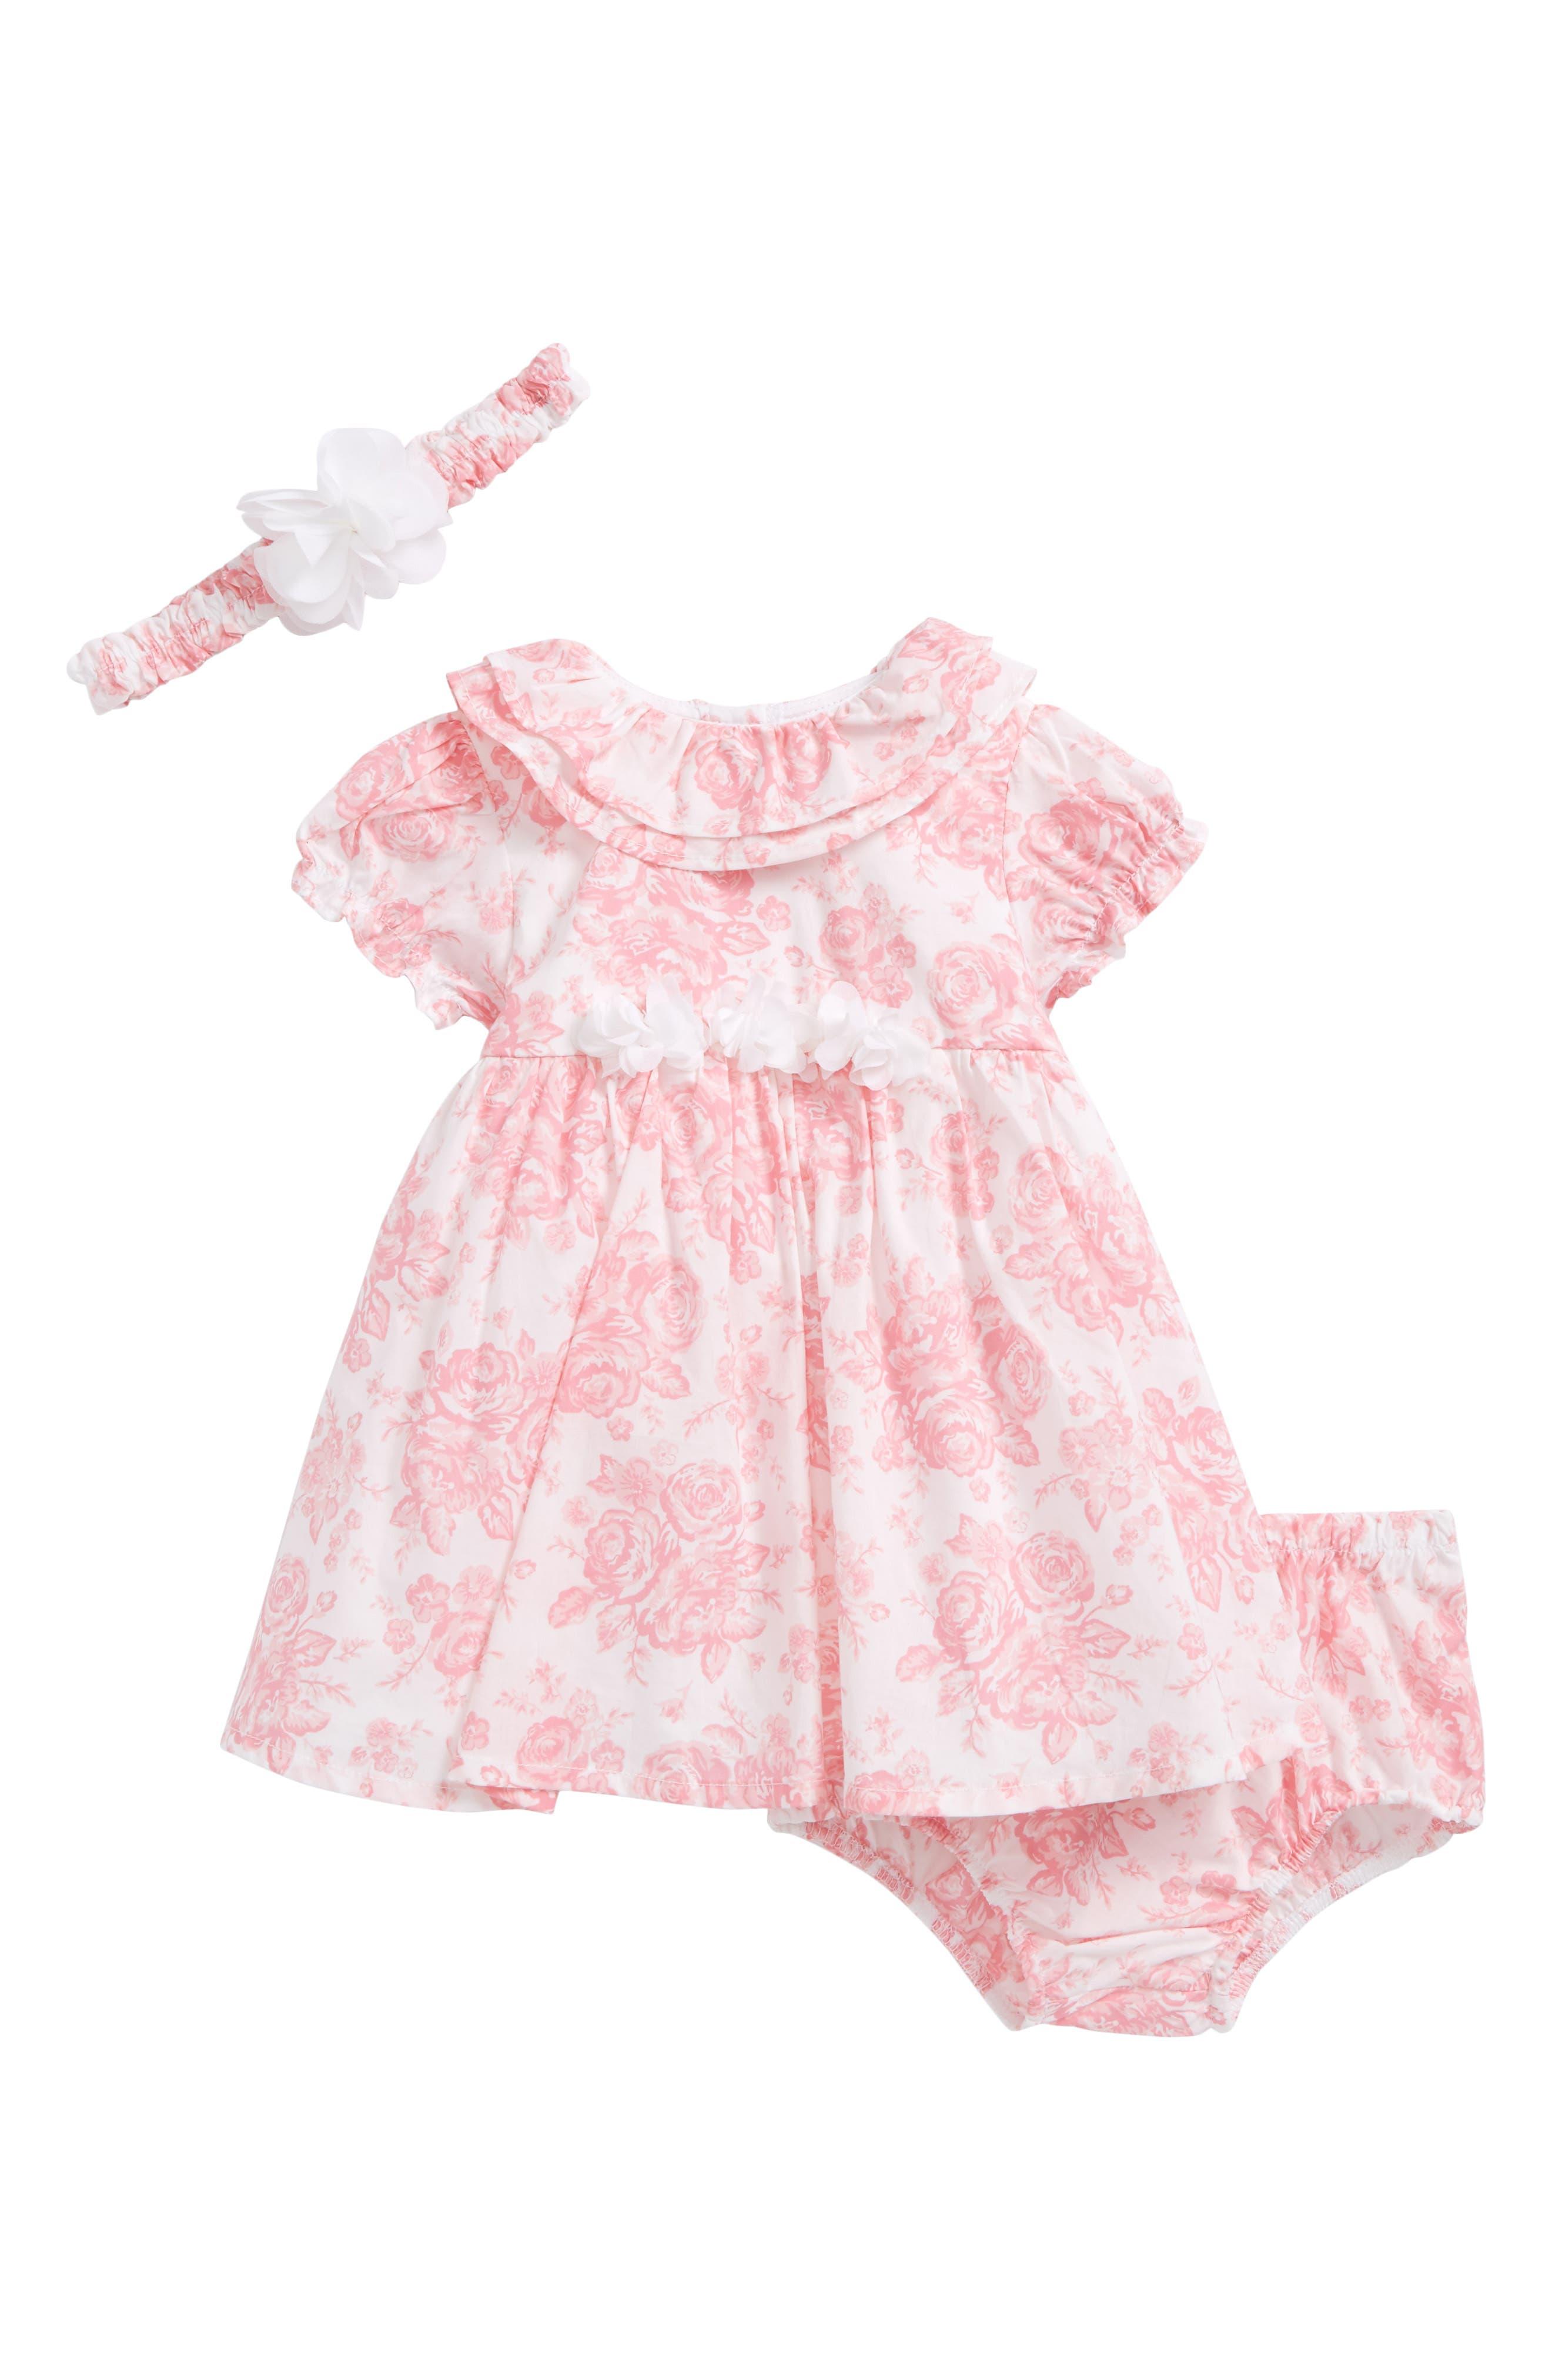 Rose Bouquet Dress & Headband Set,                         Main,                         color, White/ Pink